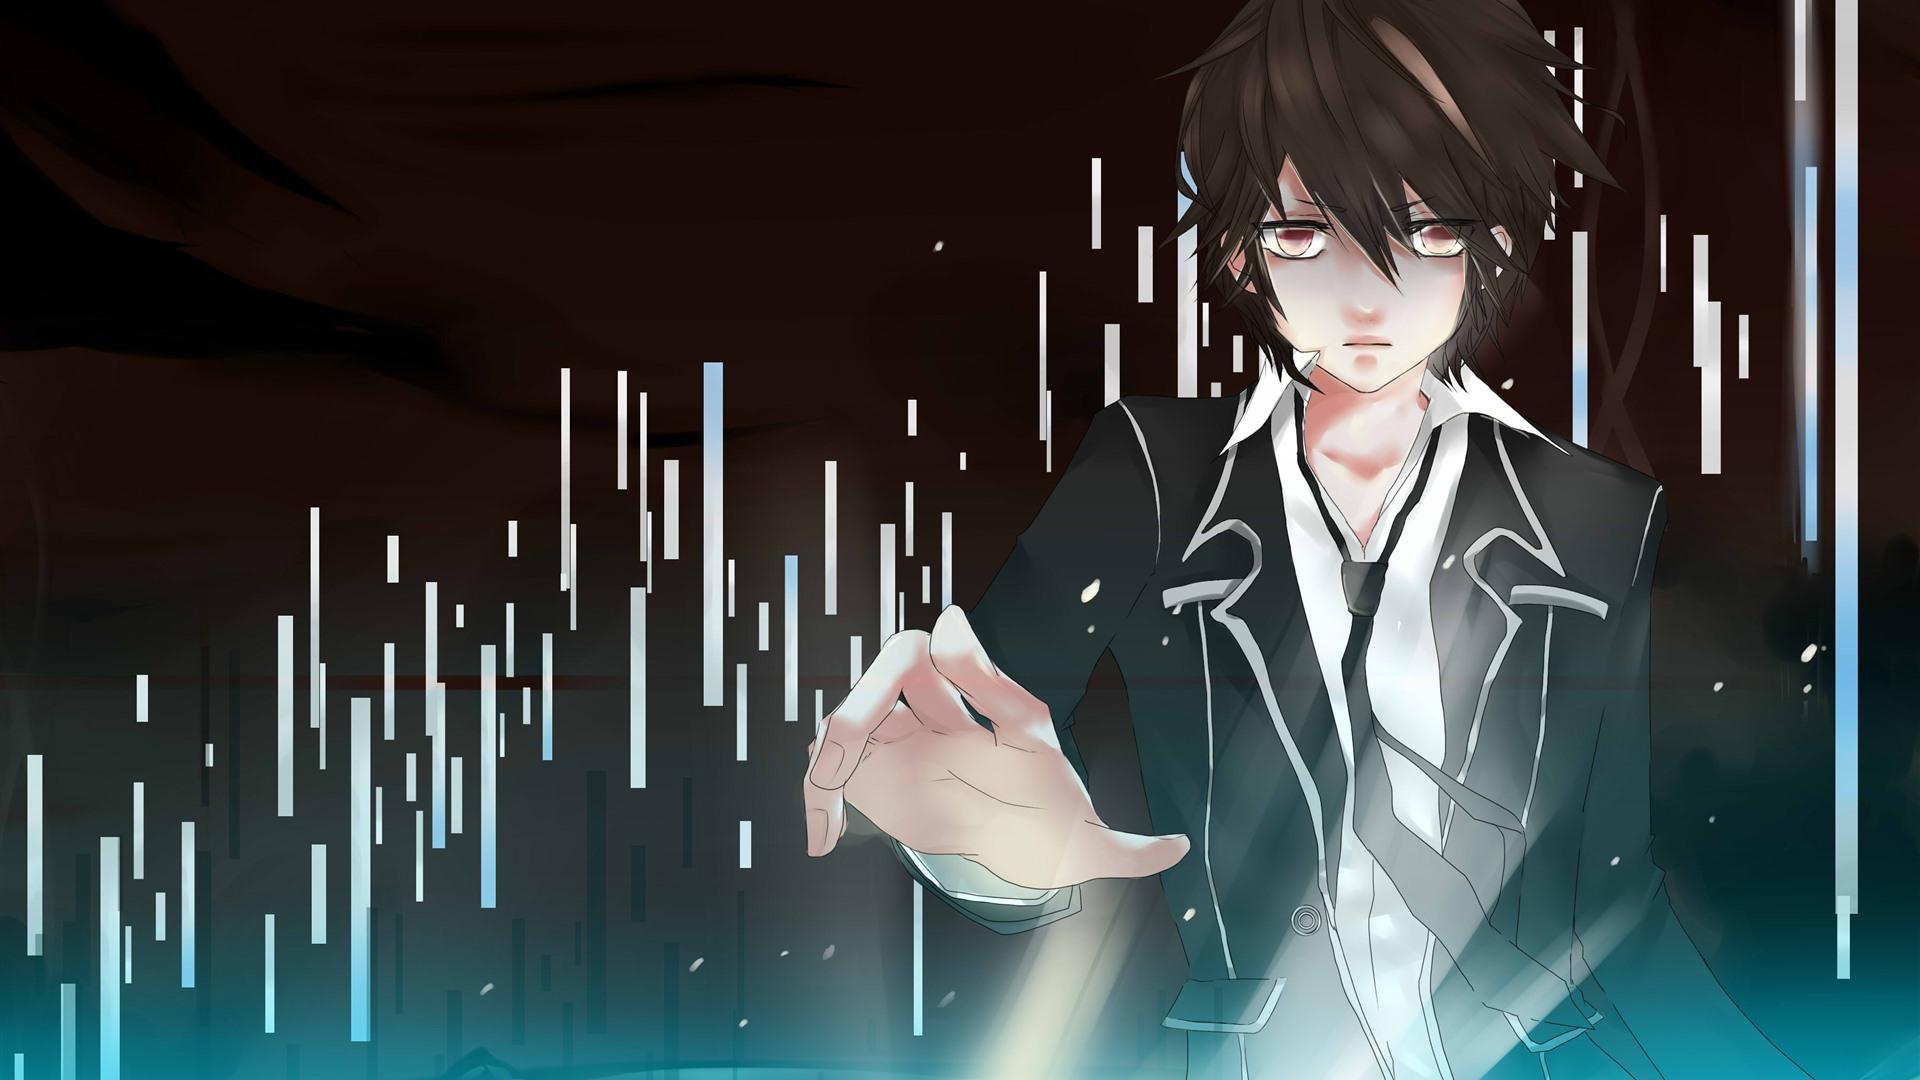 Guilty Crown Anime Boy 2880x1800 Hd Hintergrundbilder Hd Bild